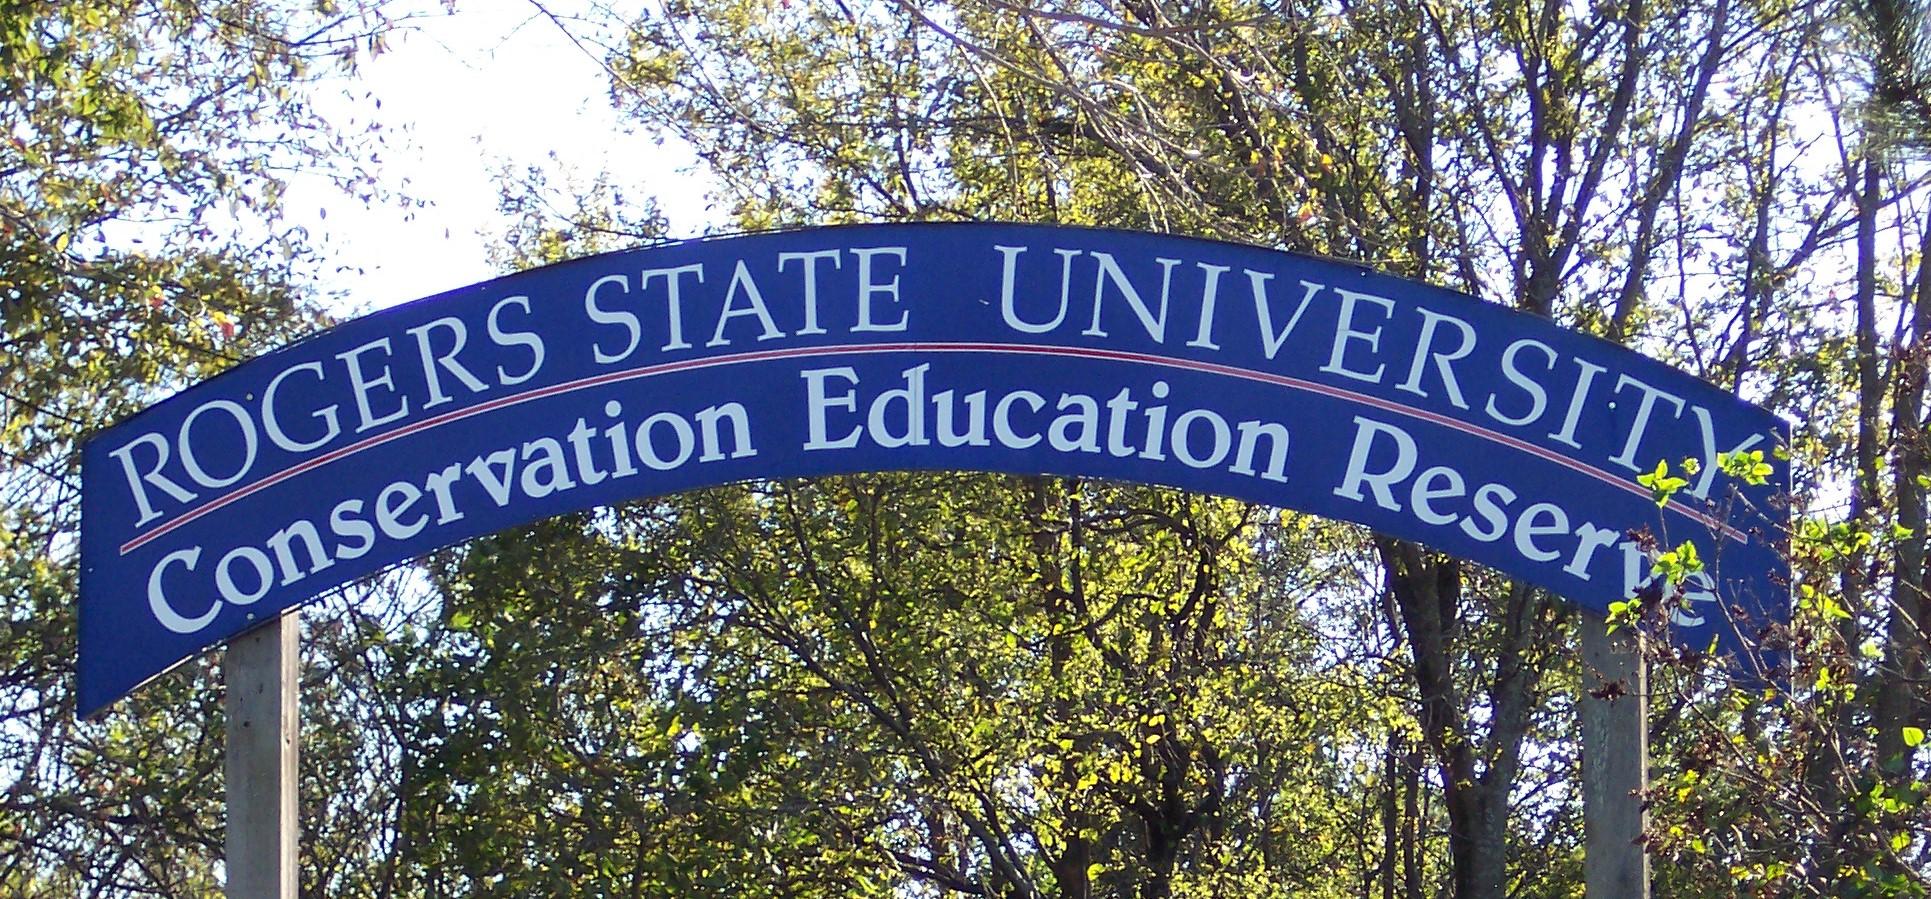 RSU Conservation